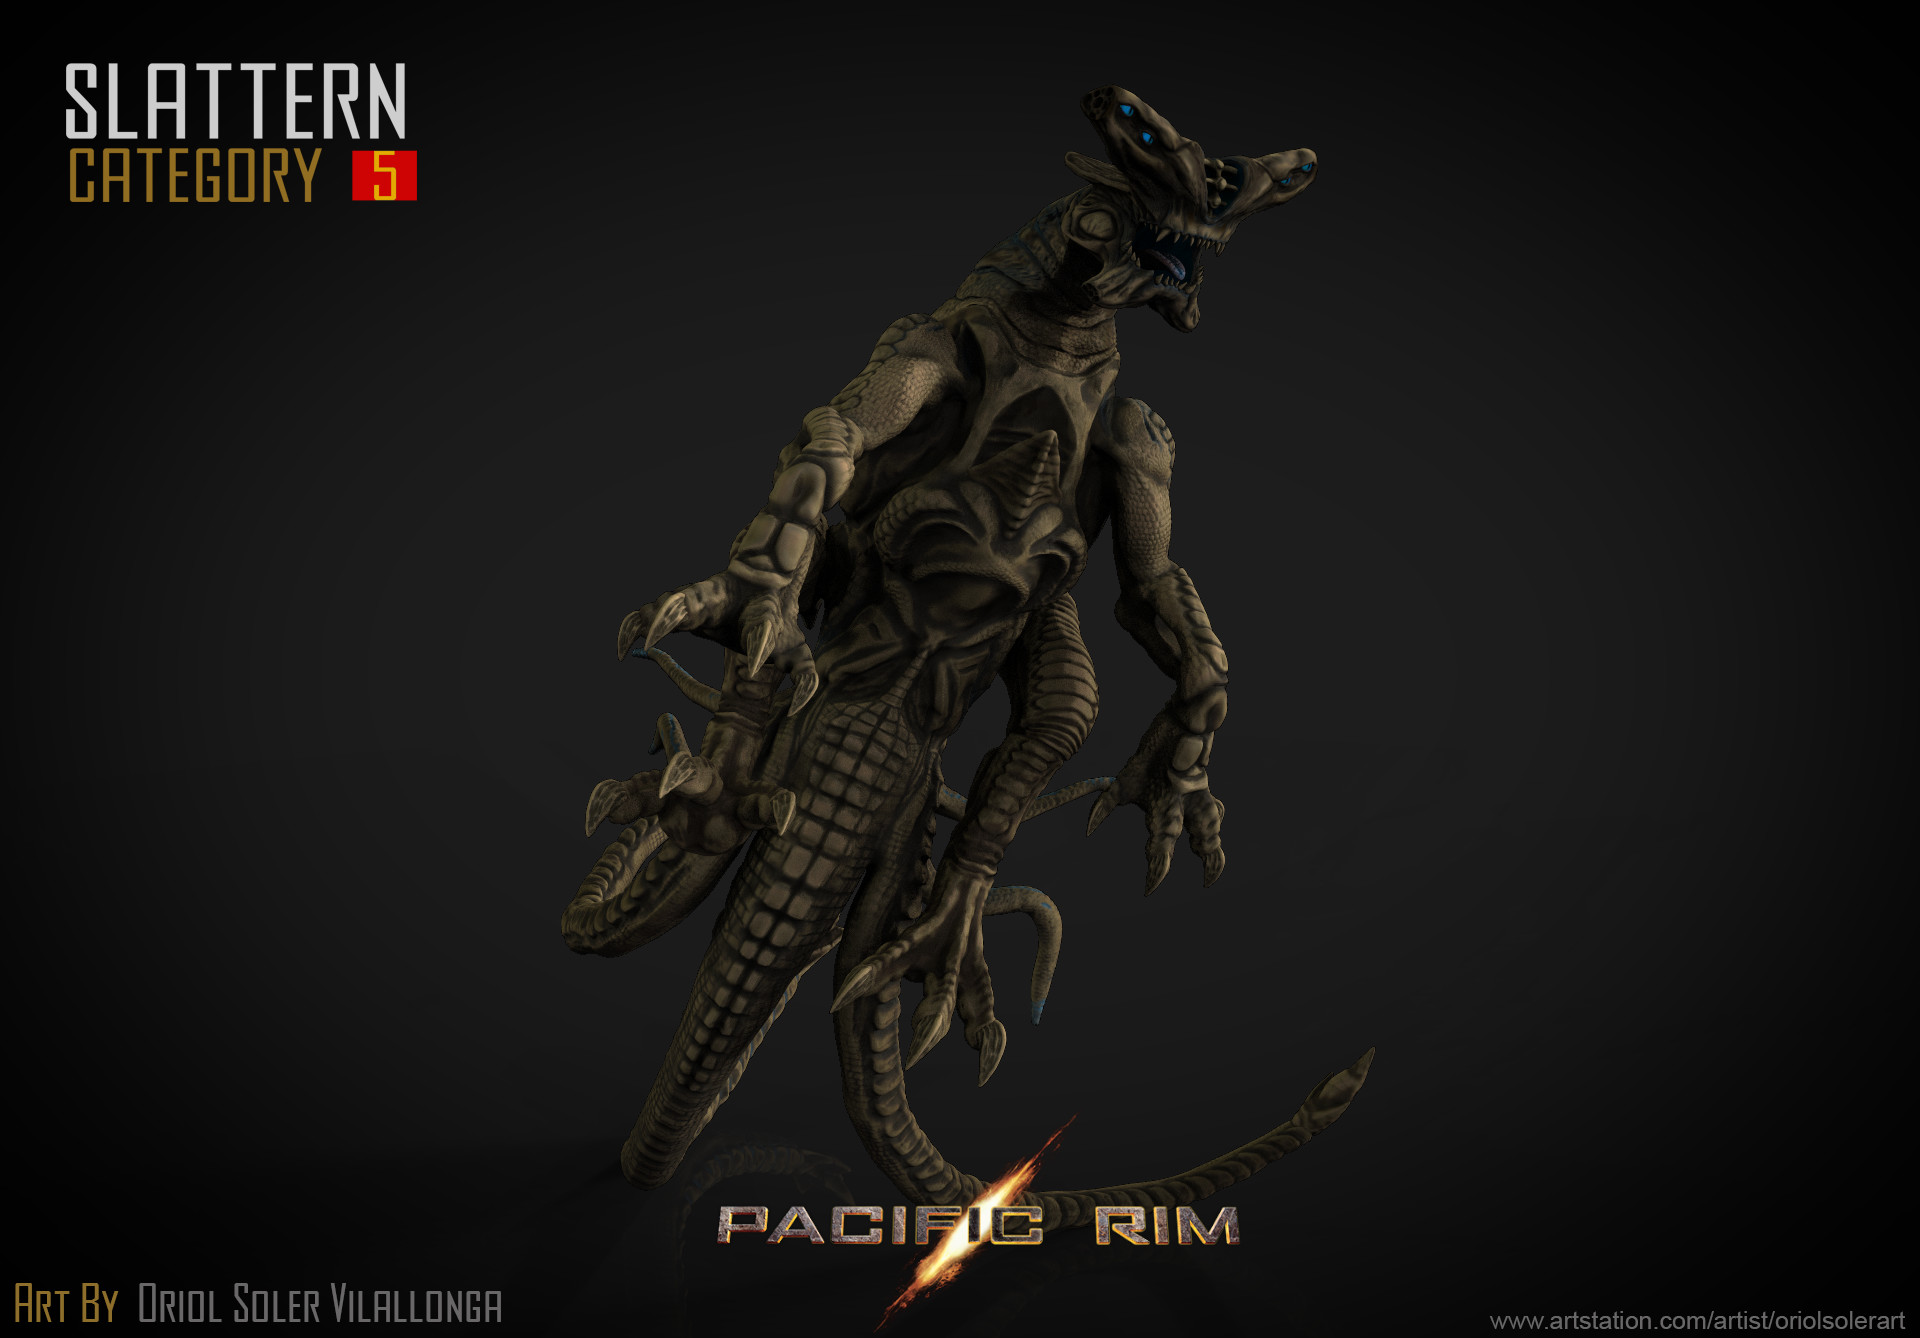 Pacific Rim Slattern